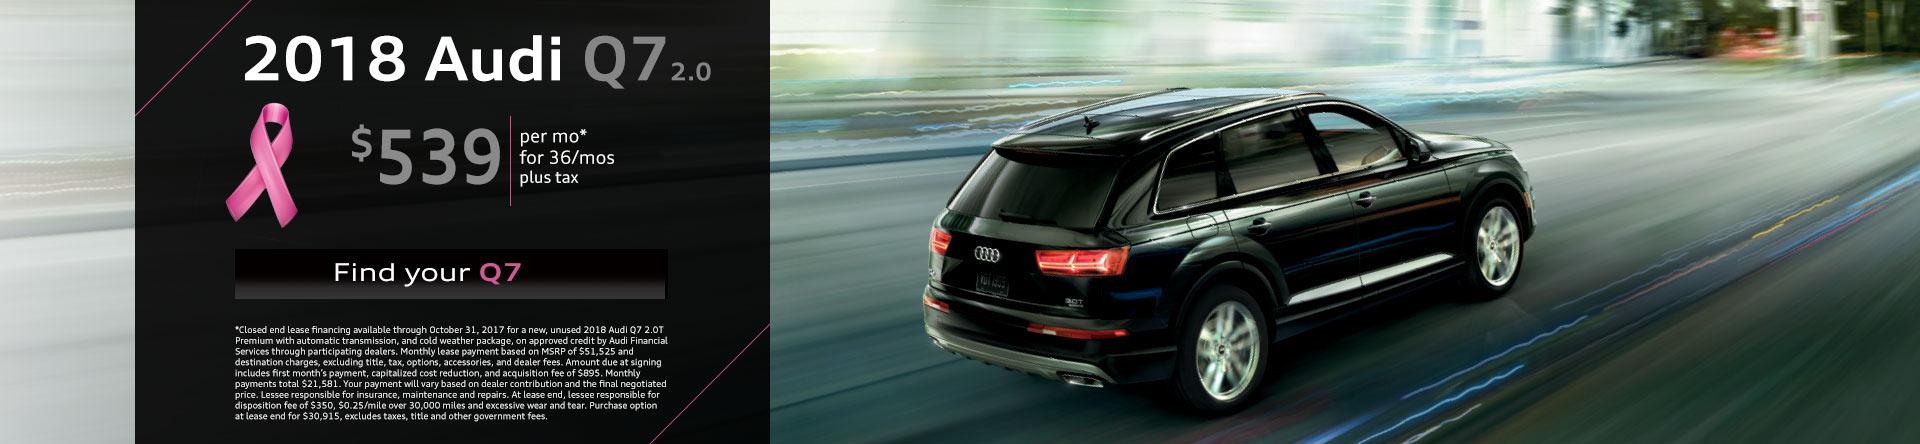 Audi Q Lease Special Audi Brooklyn Brooklyn NY - Audi q7 lease